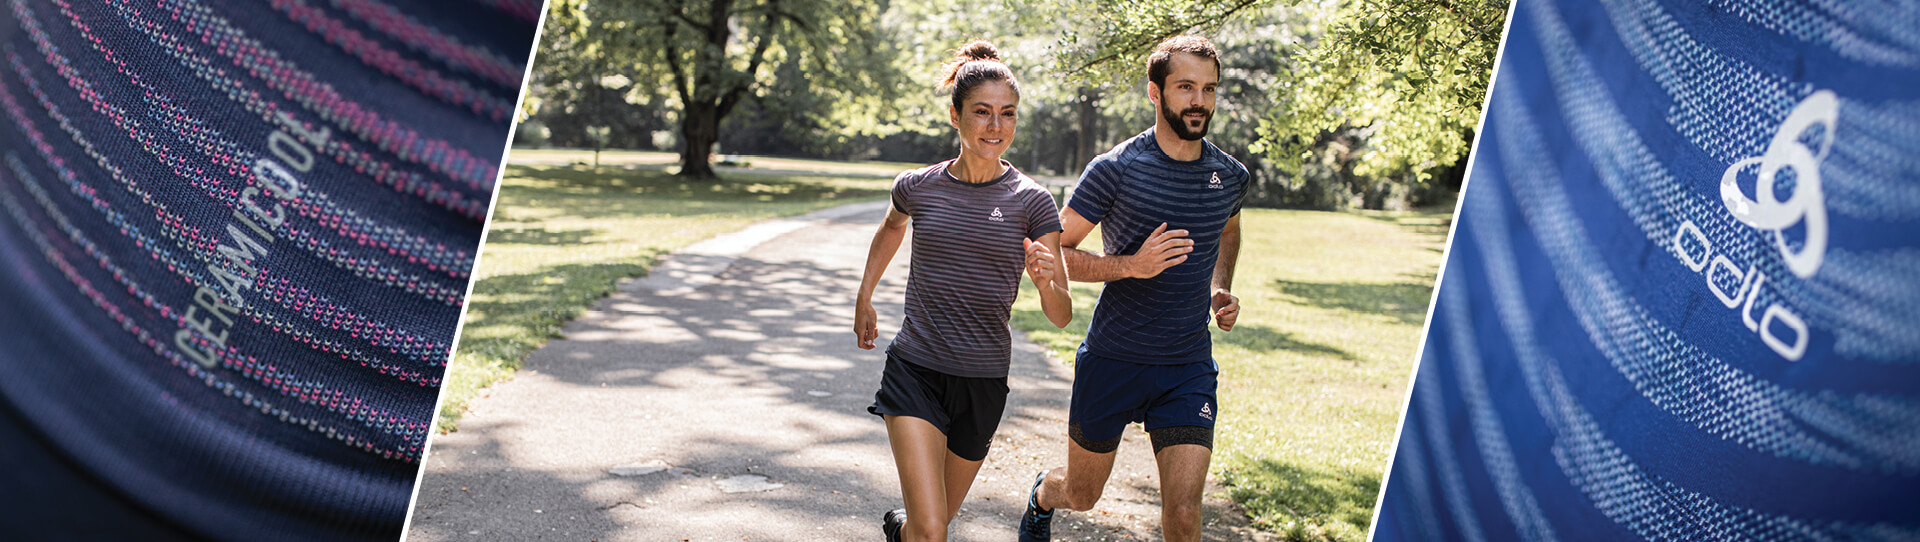 Blackcomb - high-performance sports underwear